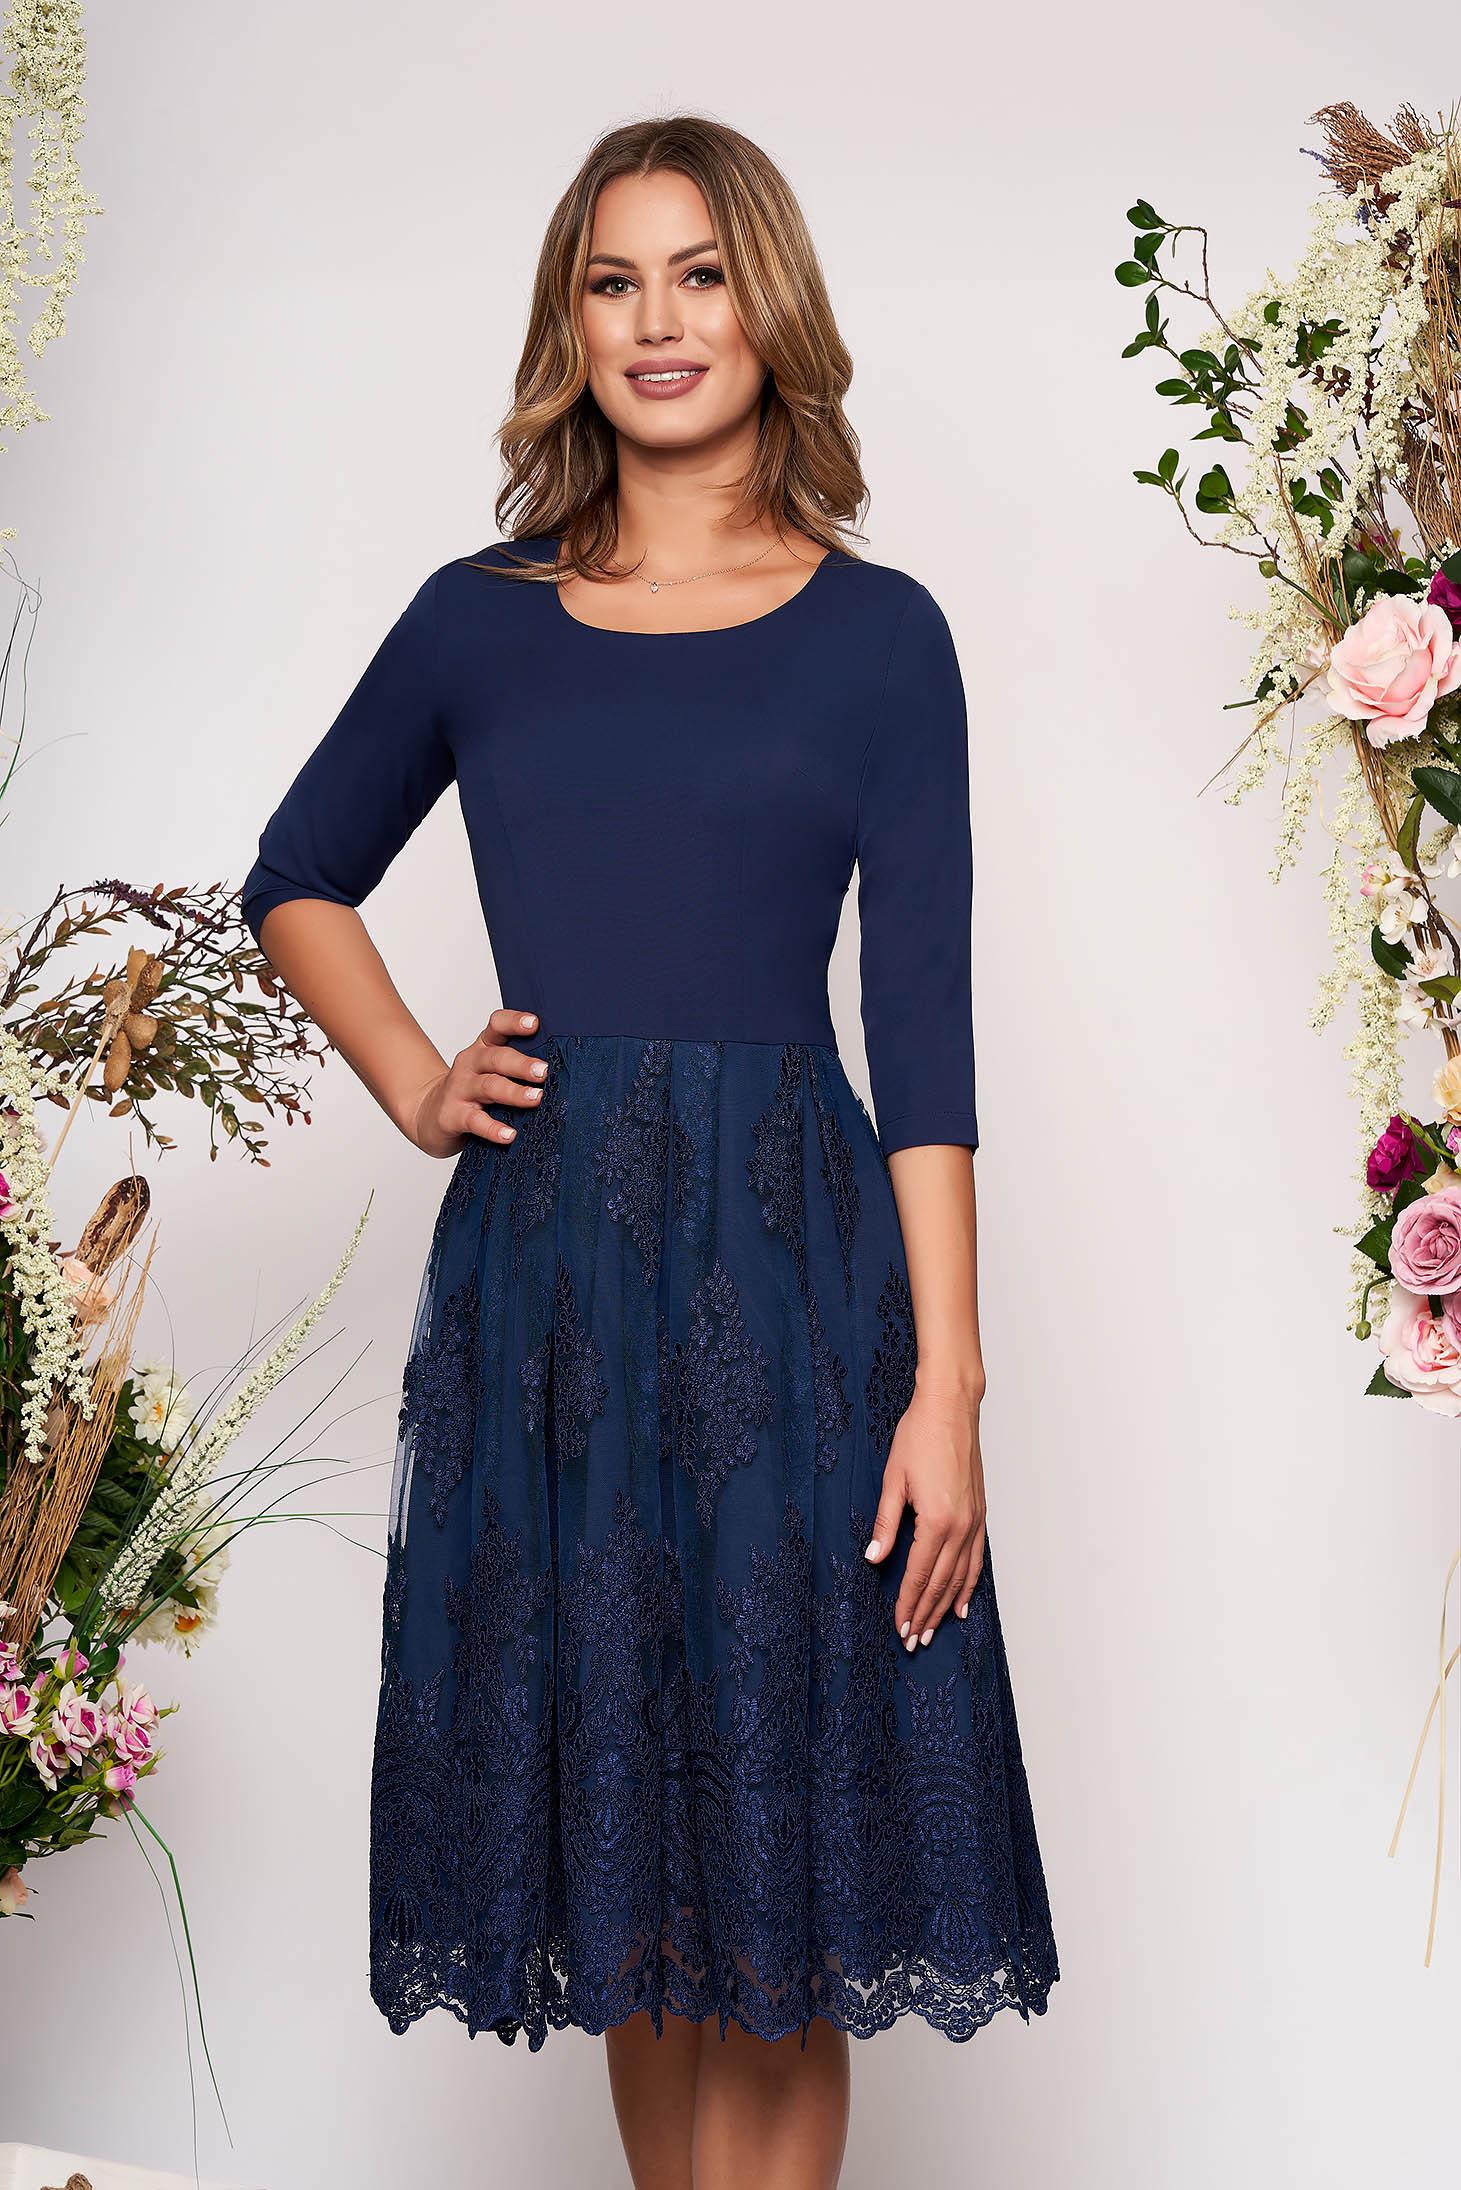 Rochie albastru-inchis midi eleganta in clos din material usor elastic cu maneci trei-sferturi si fusta din dantela